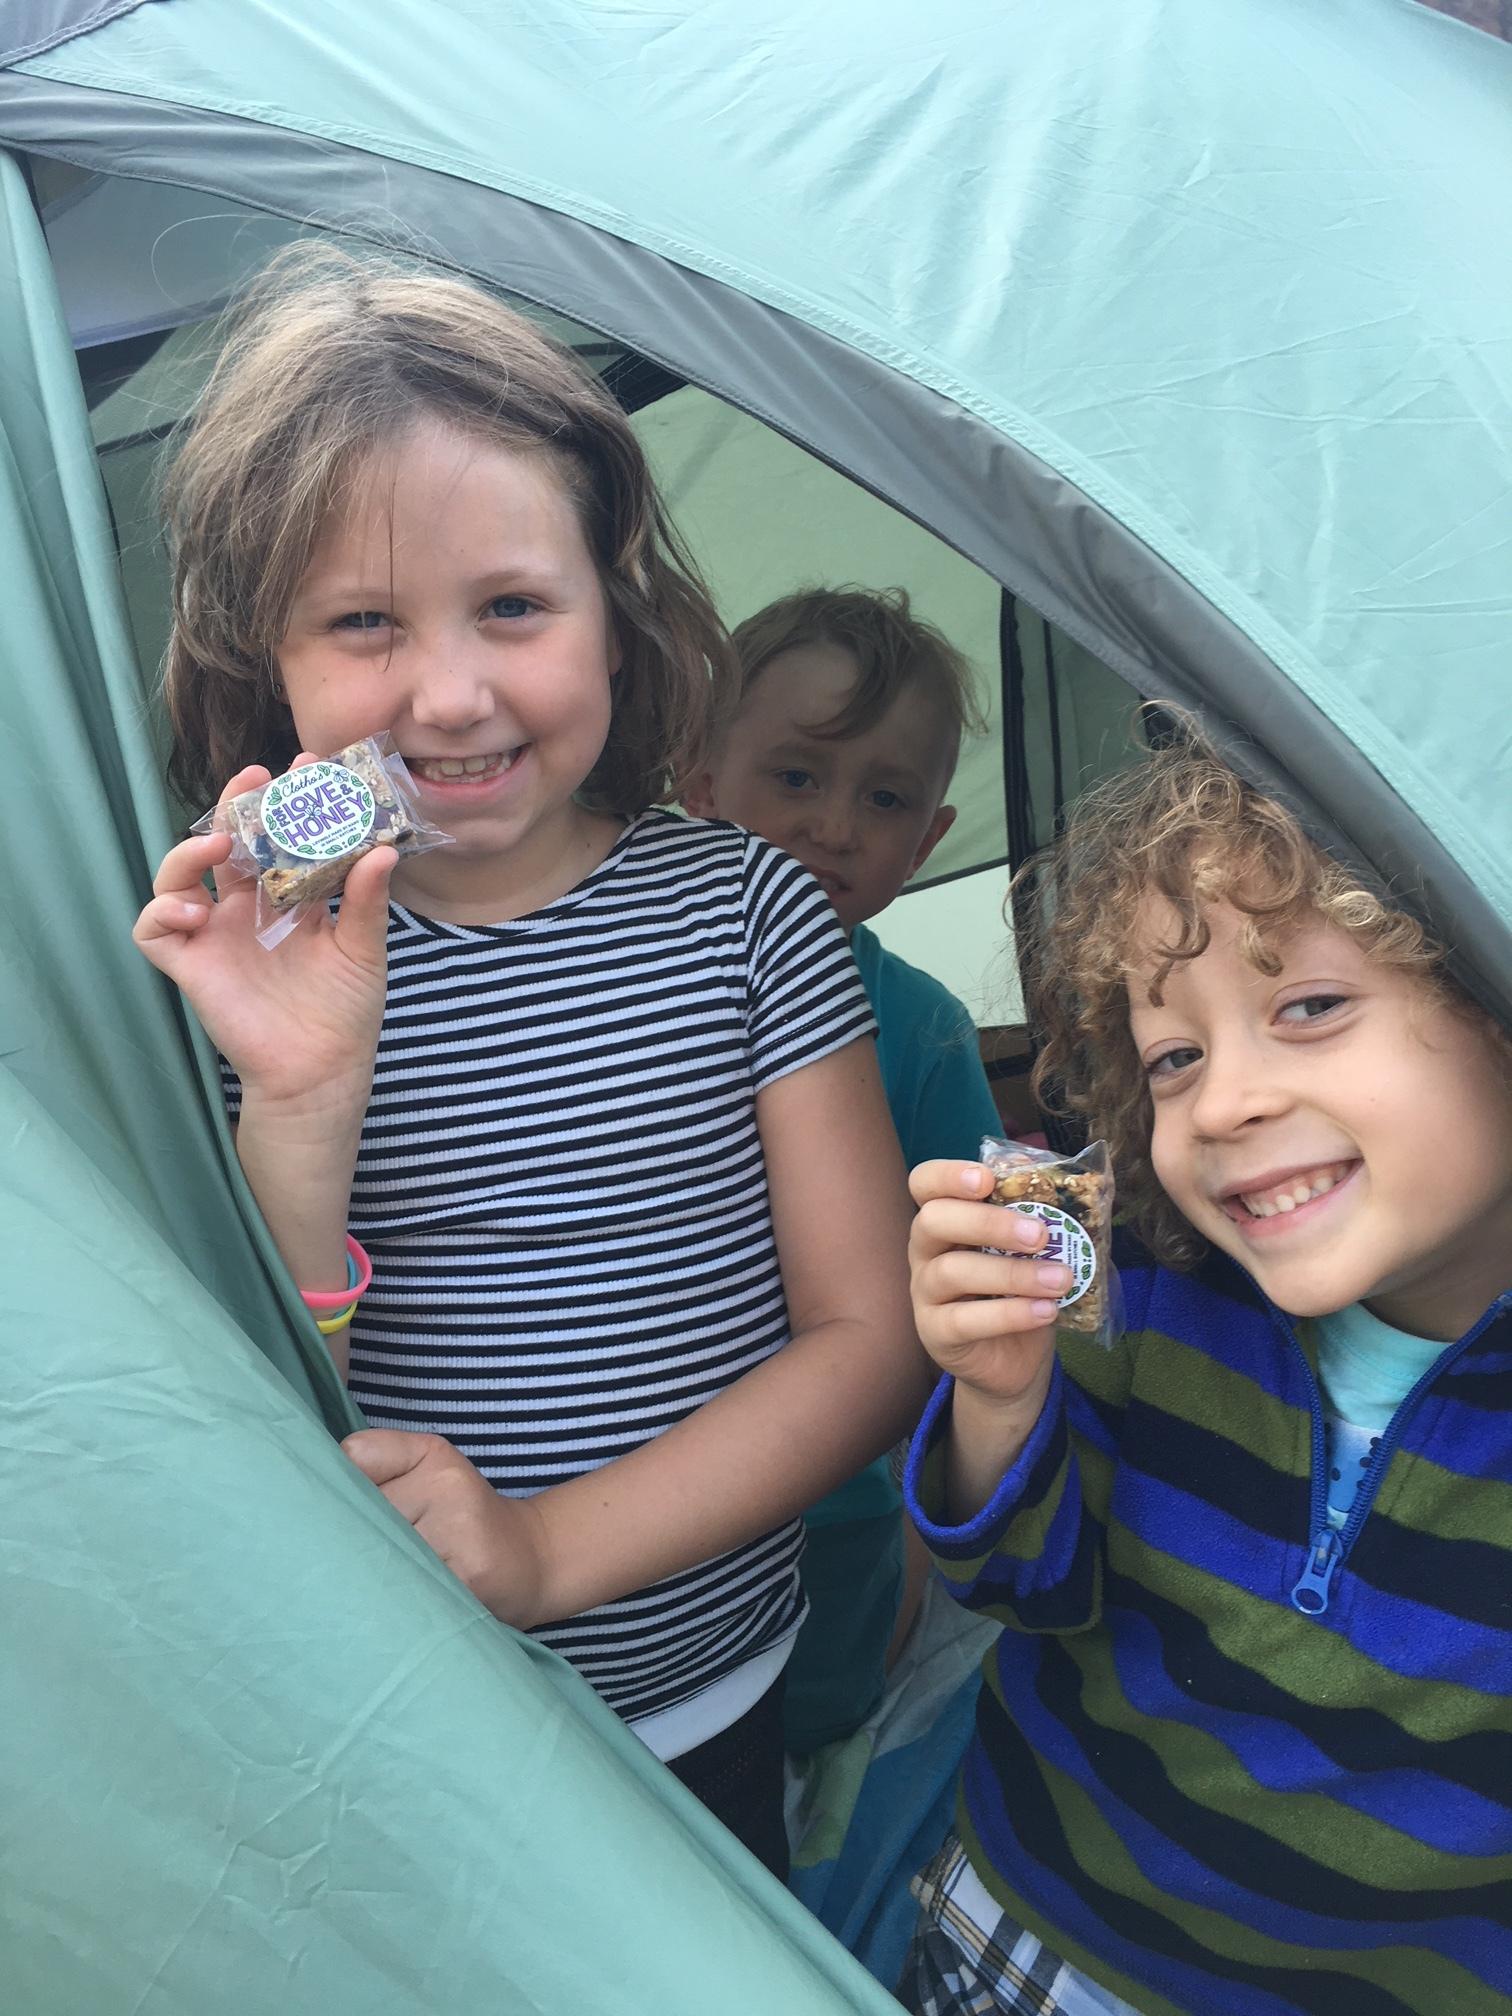 Kids +Camping+ Granola Bars = Happiness!